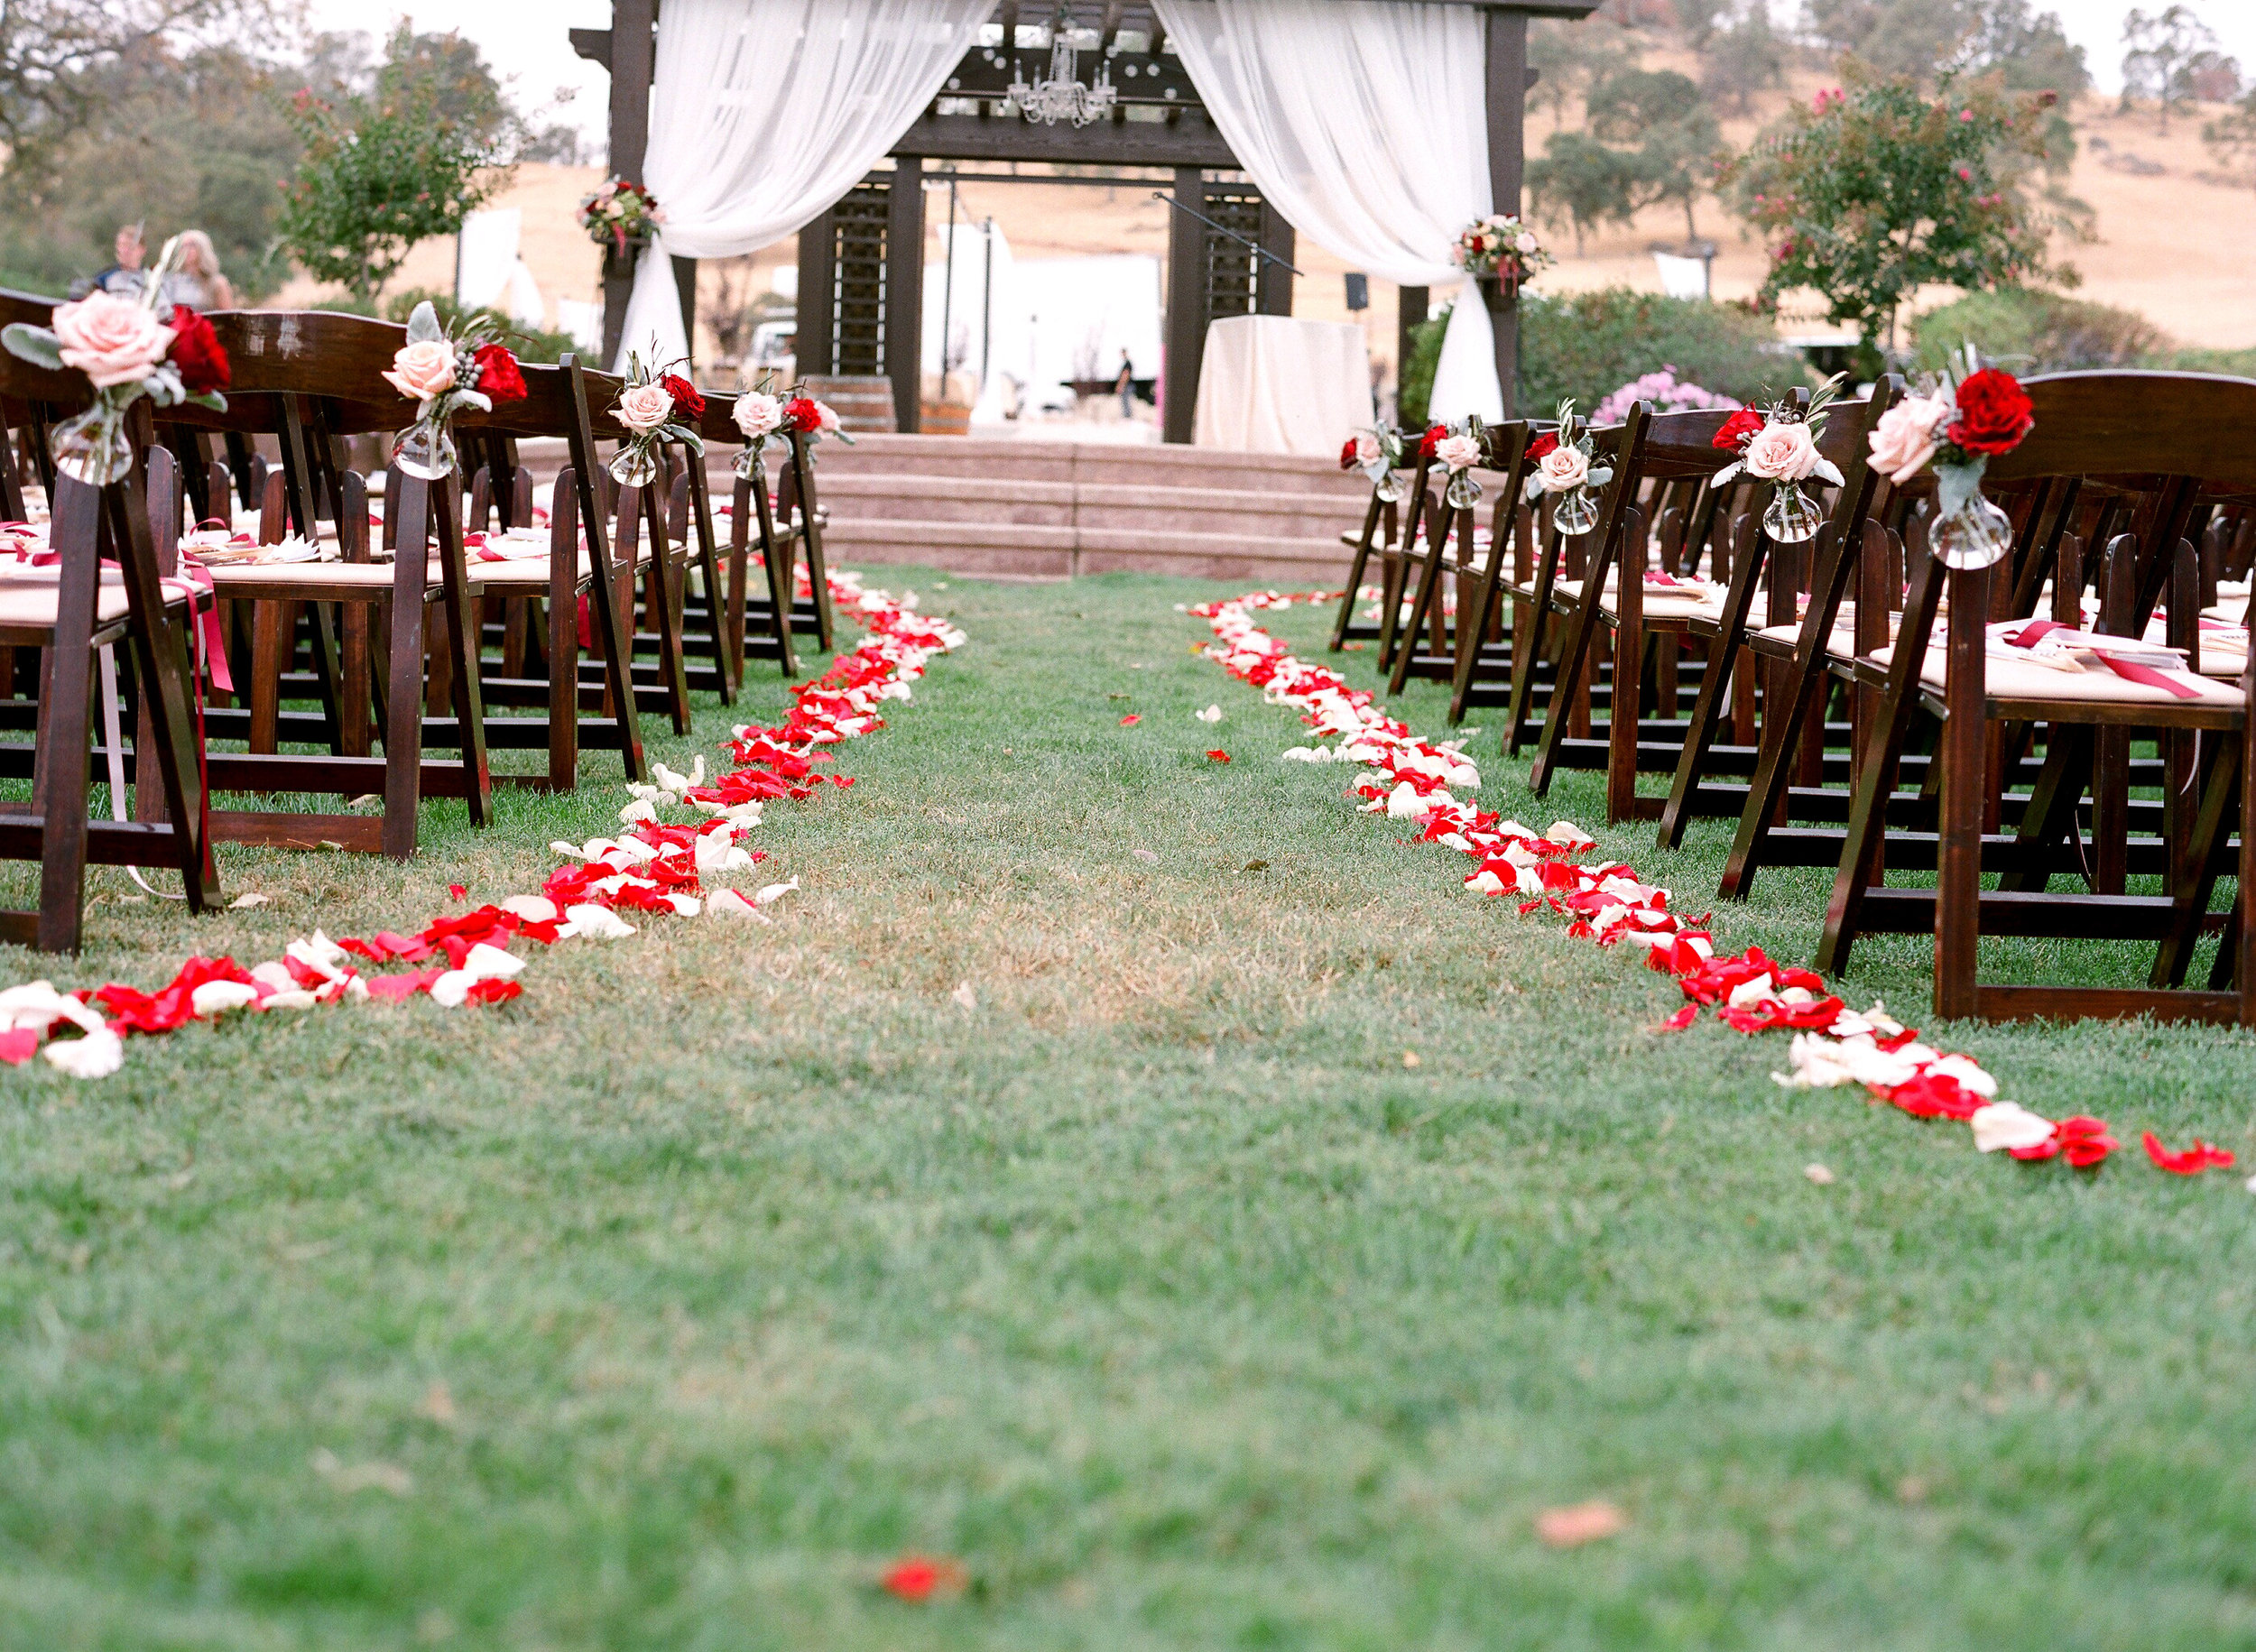 Aisle_Arrangements_Petals_Draping_Rancho_Victoria_Vineyard_Northern_California.jpg